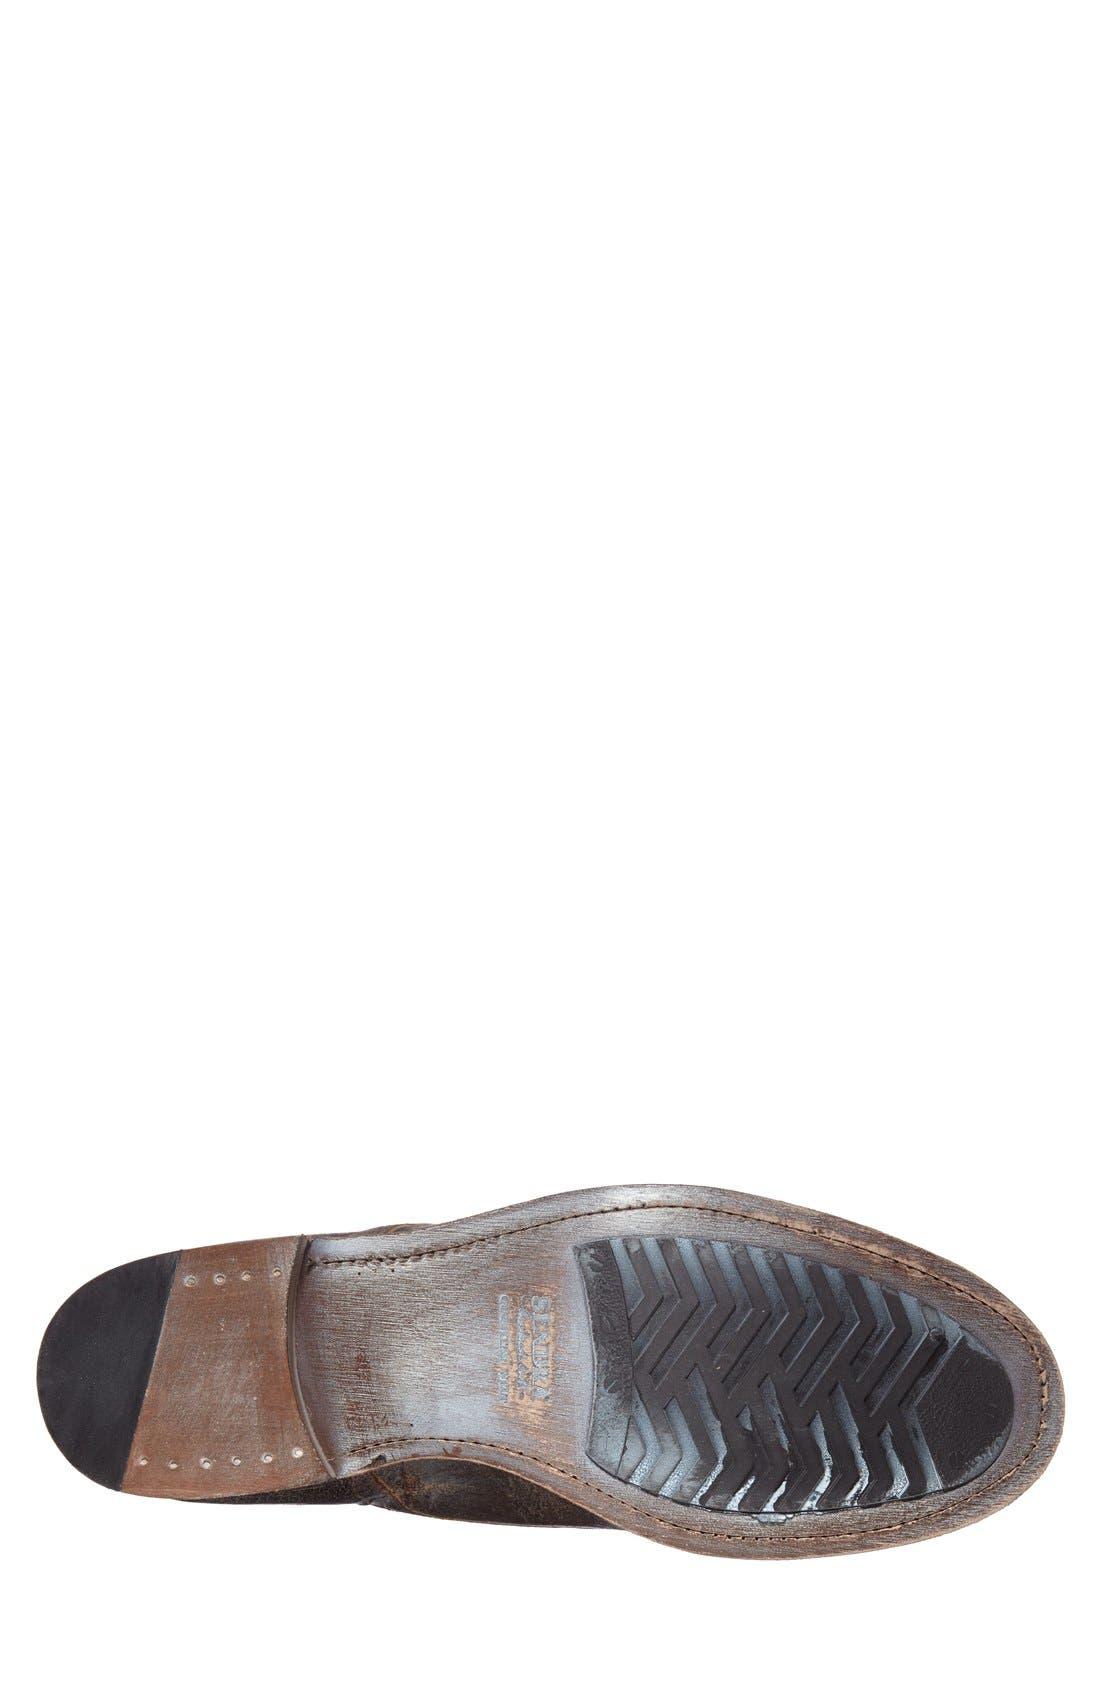 Boots 'Friar Tuk' Double Monk Strap Shoe,                             Alternate thumbnail 4, color,                             200